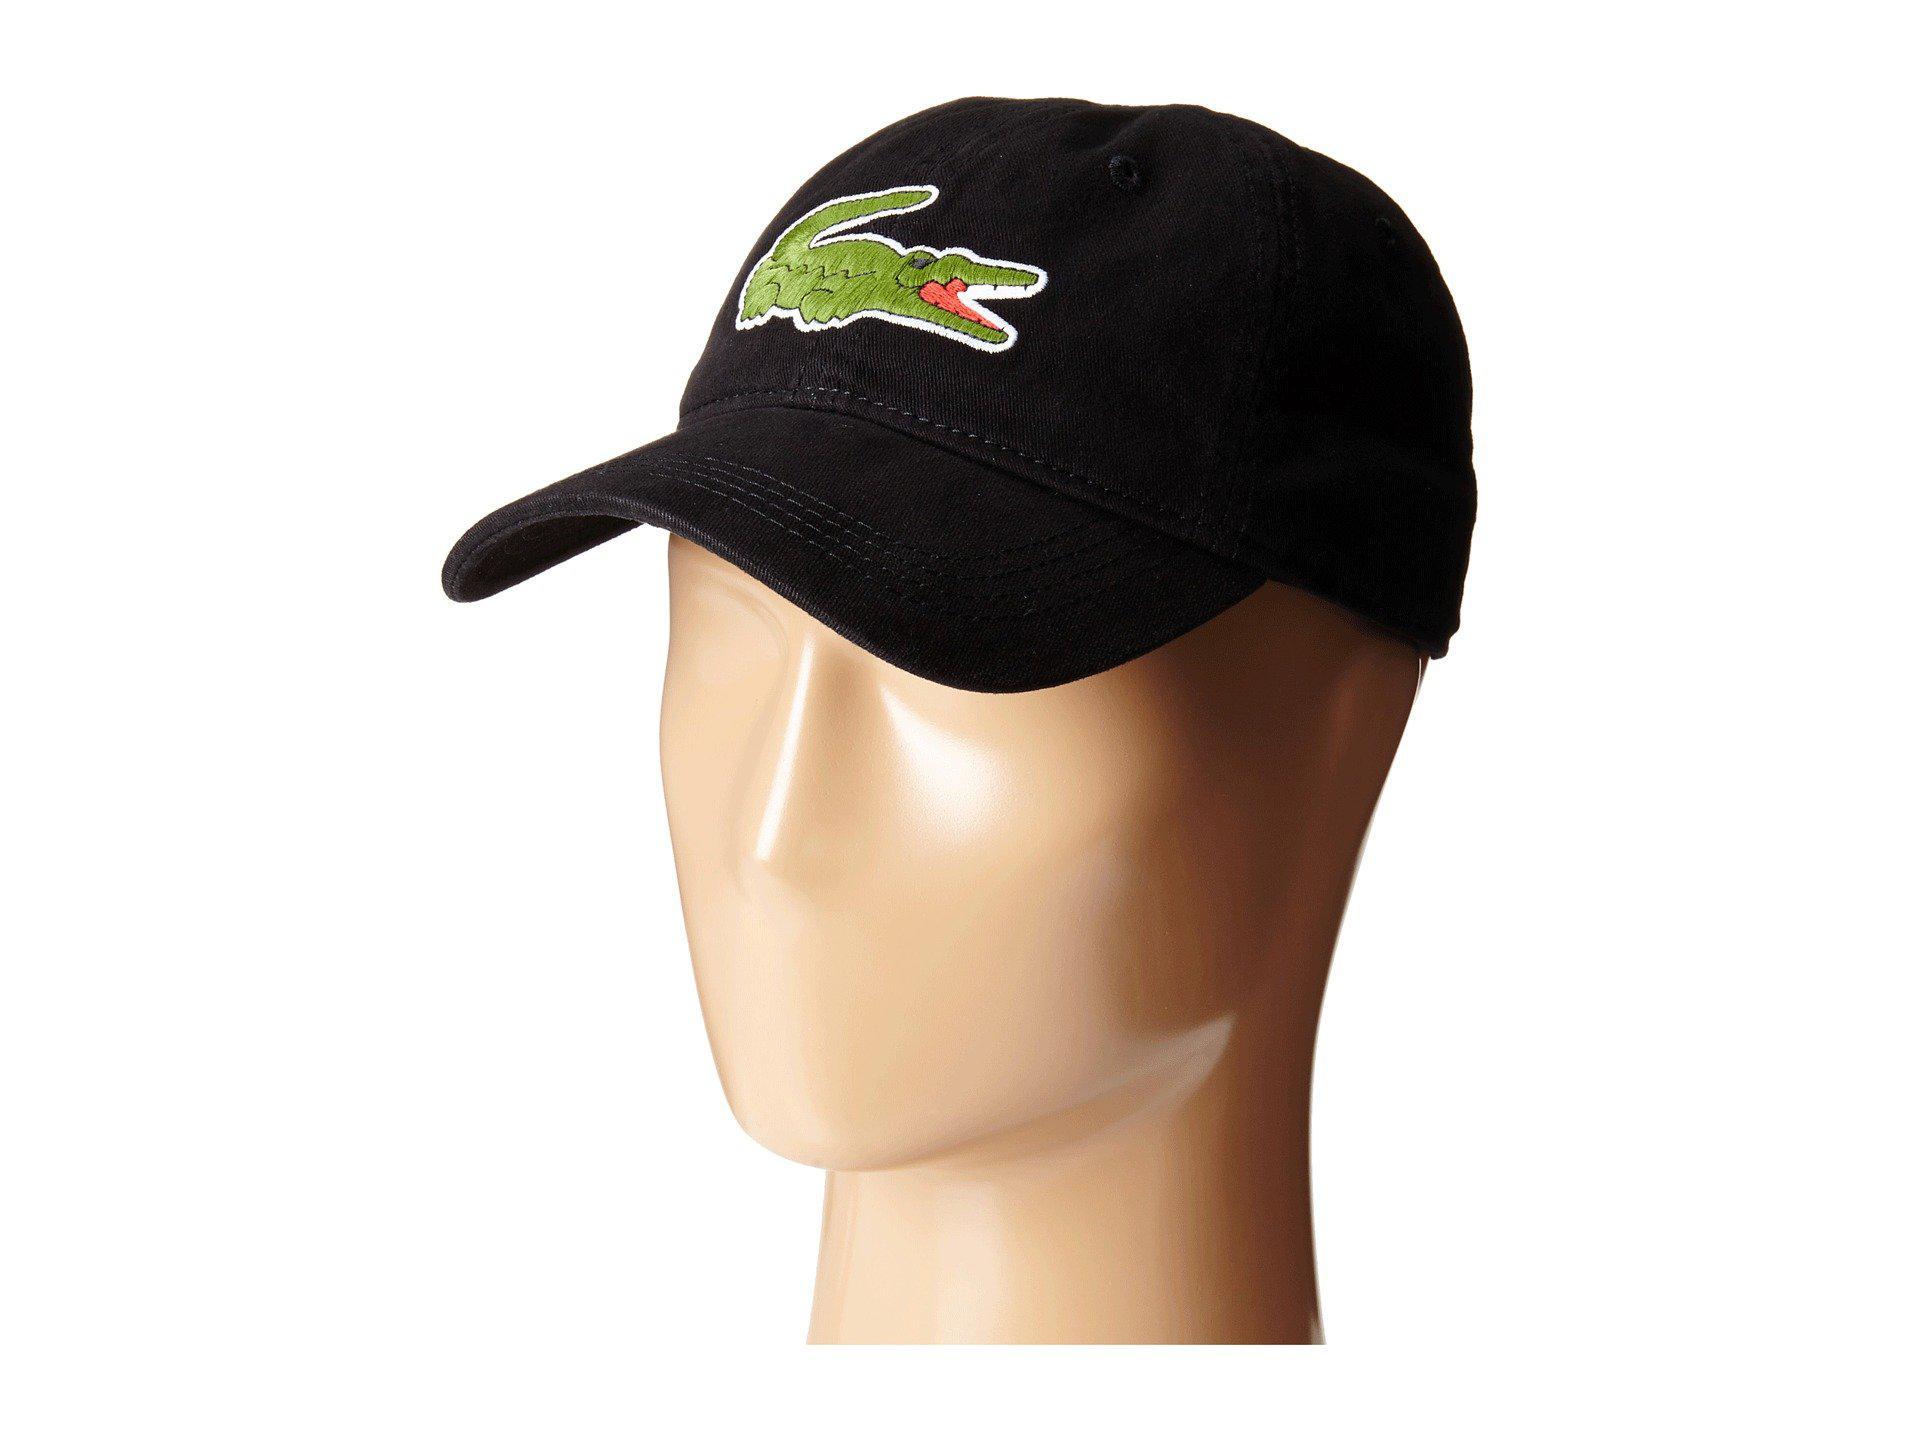 a214e66ab Lyst - Lacoste Big Croc Gabardine Cap (sinople) Baseball Caps in ...